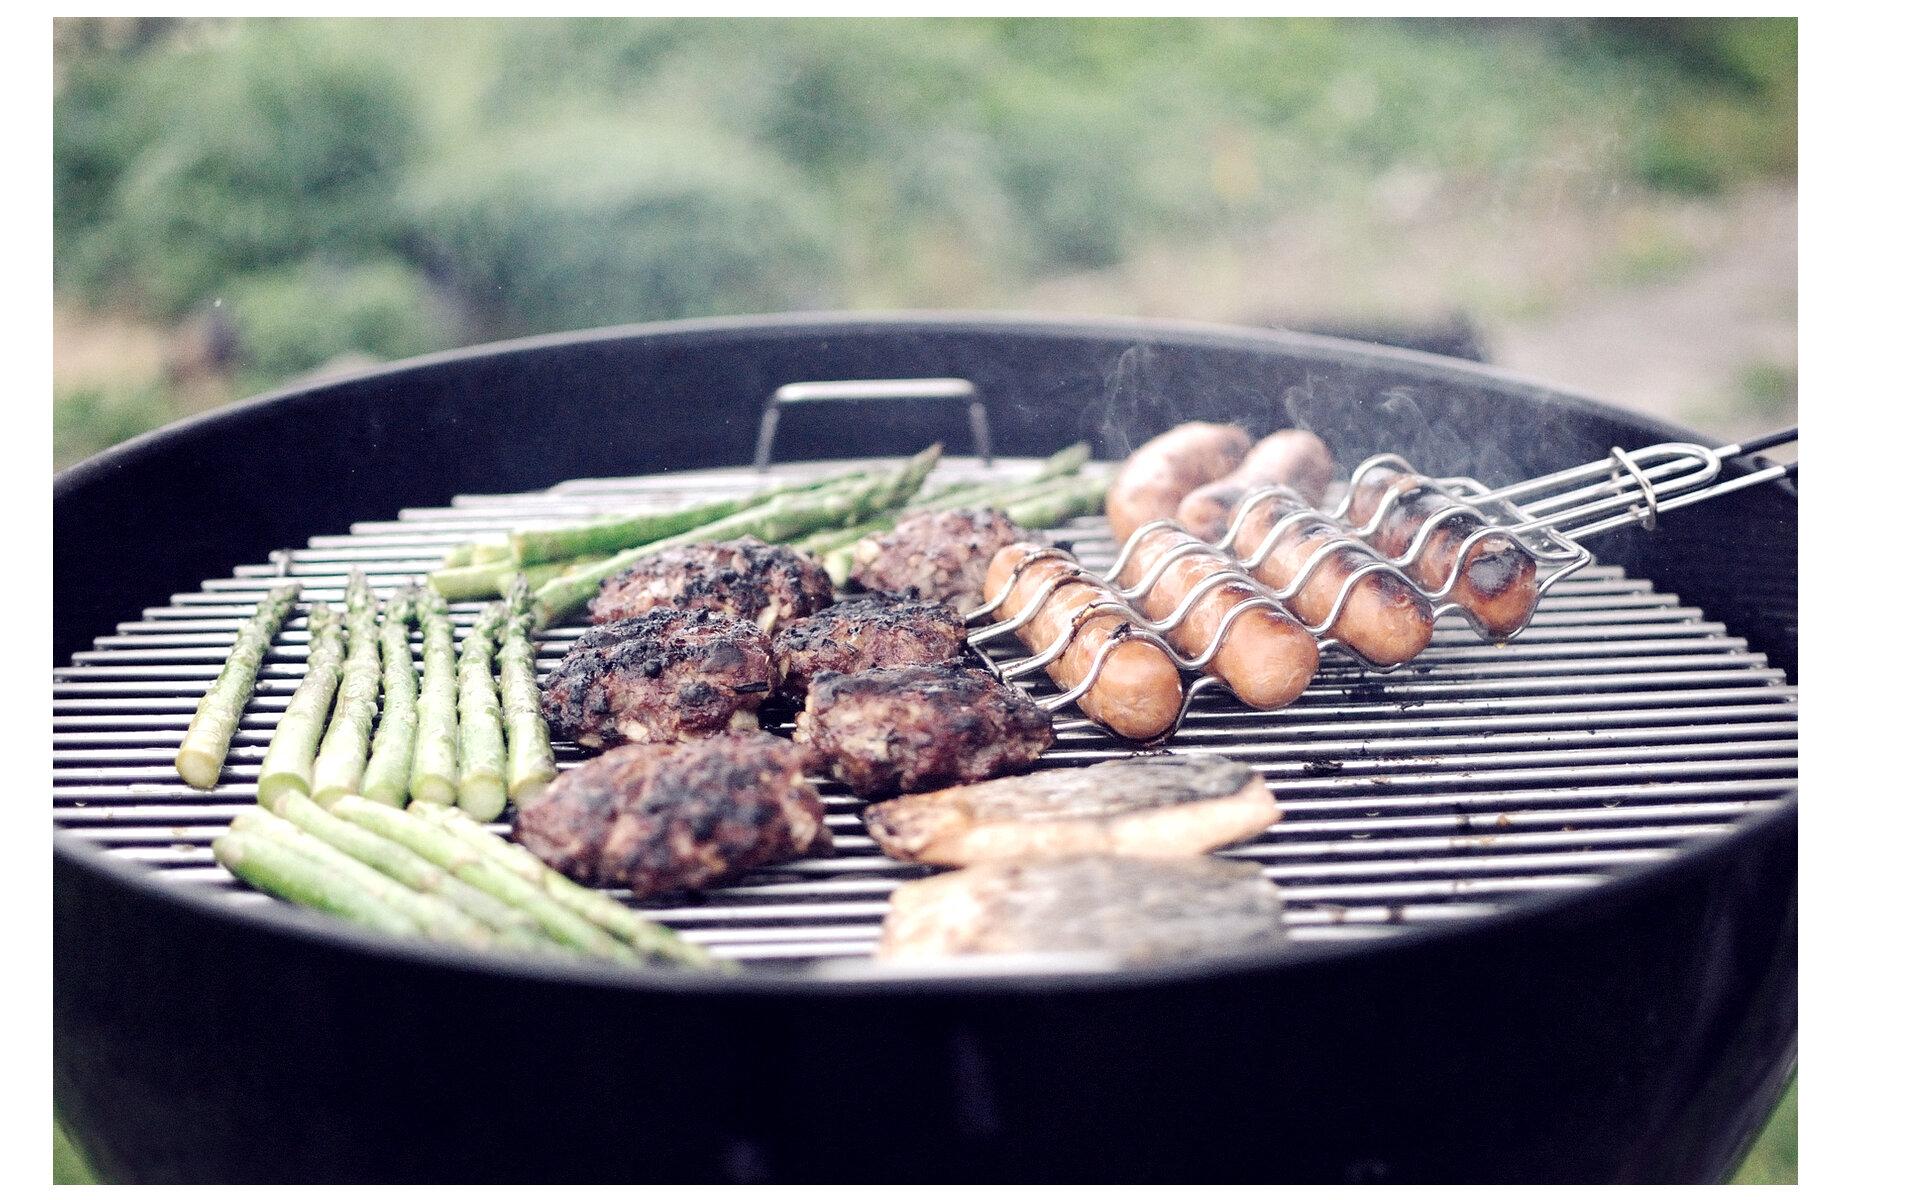 Carnation Filter - BBQ cooking sasages asparagus.jpg